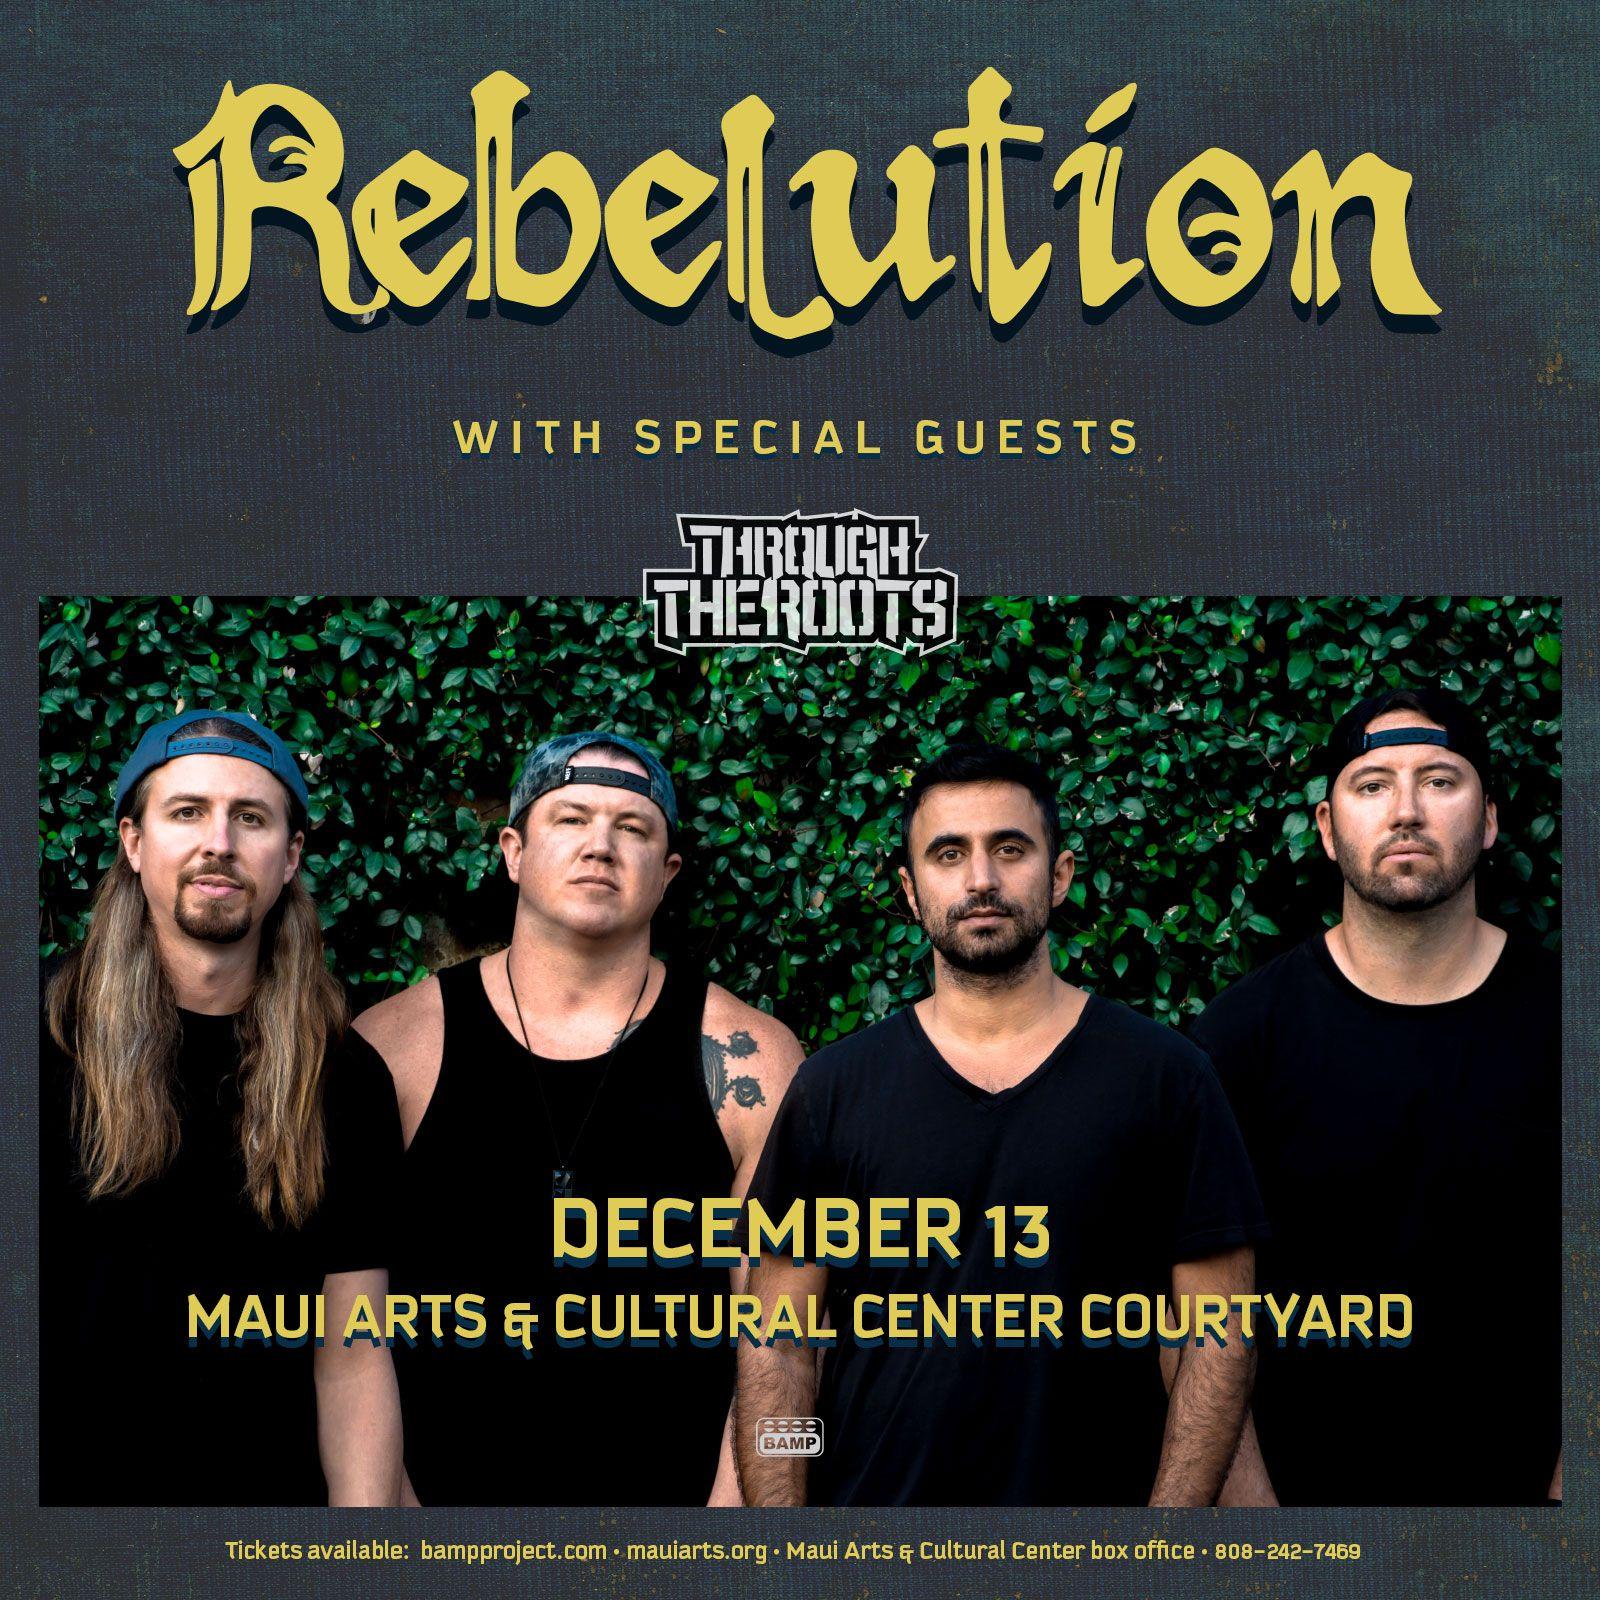 Rebelution_Maui_ig_1600x1600.jpg